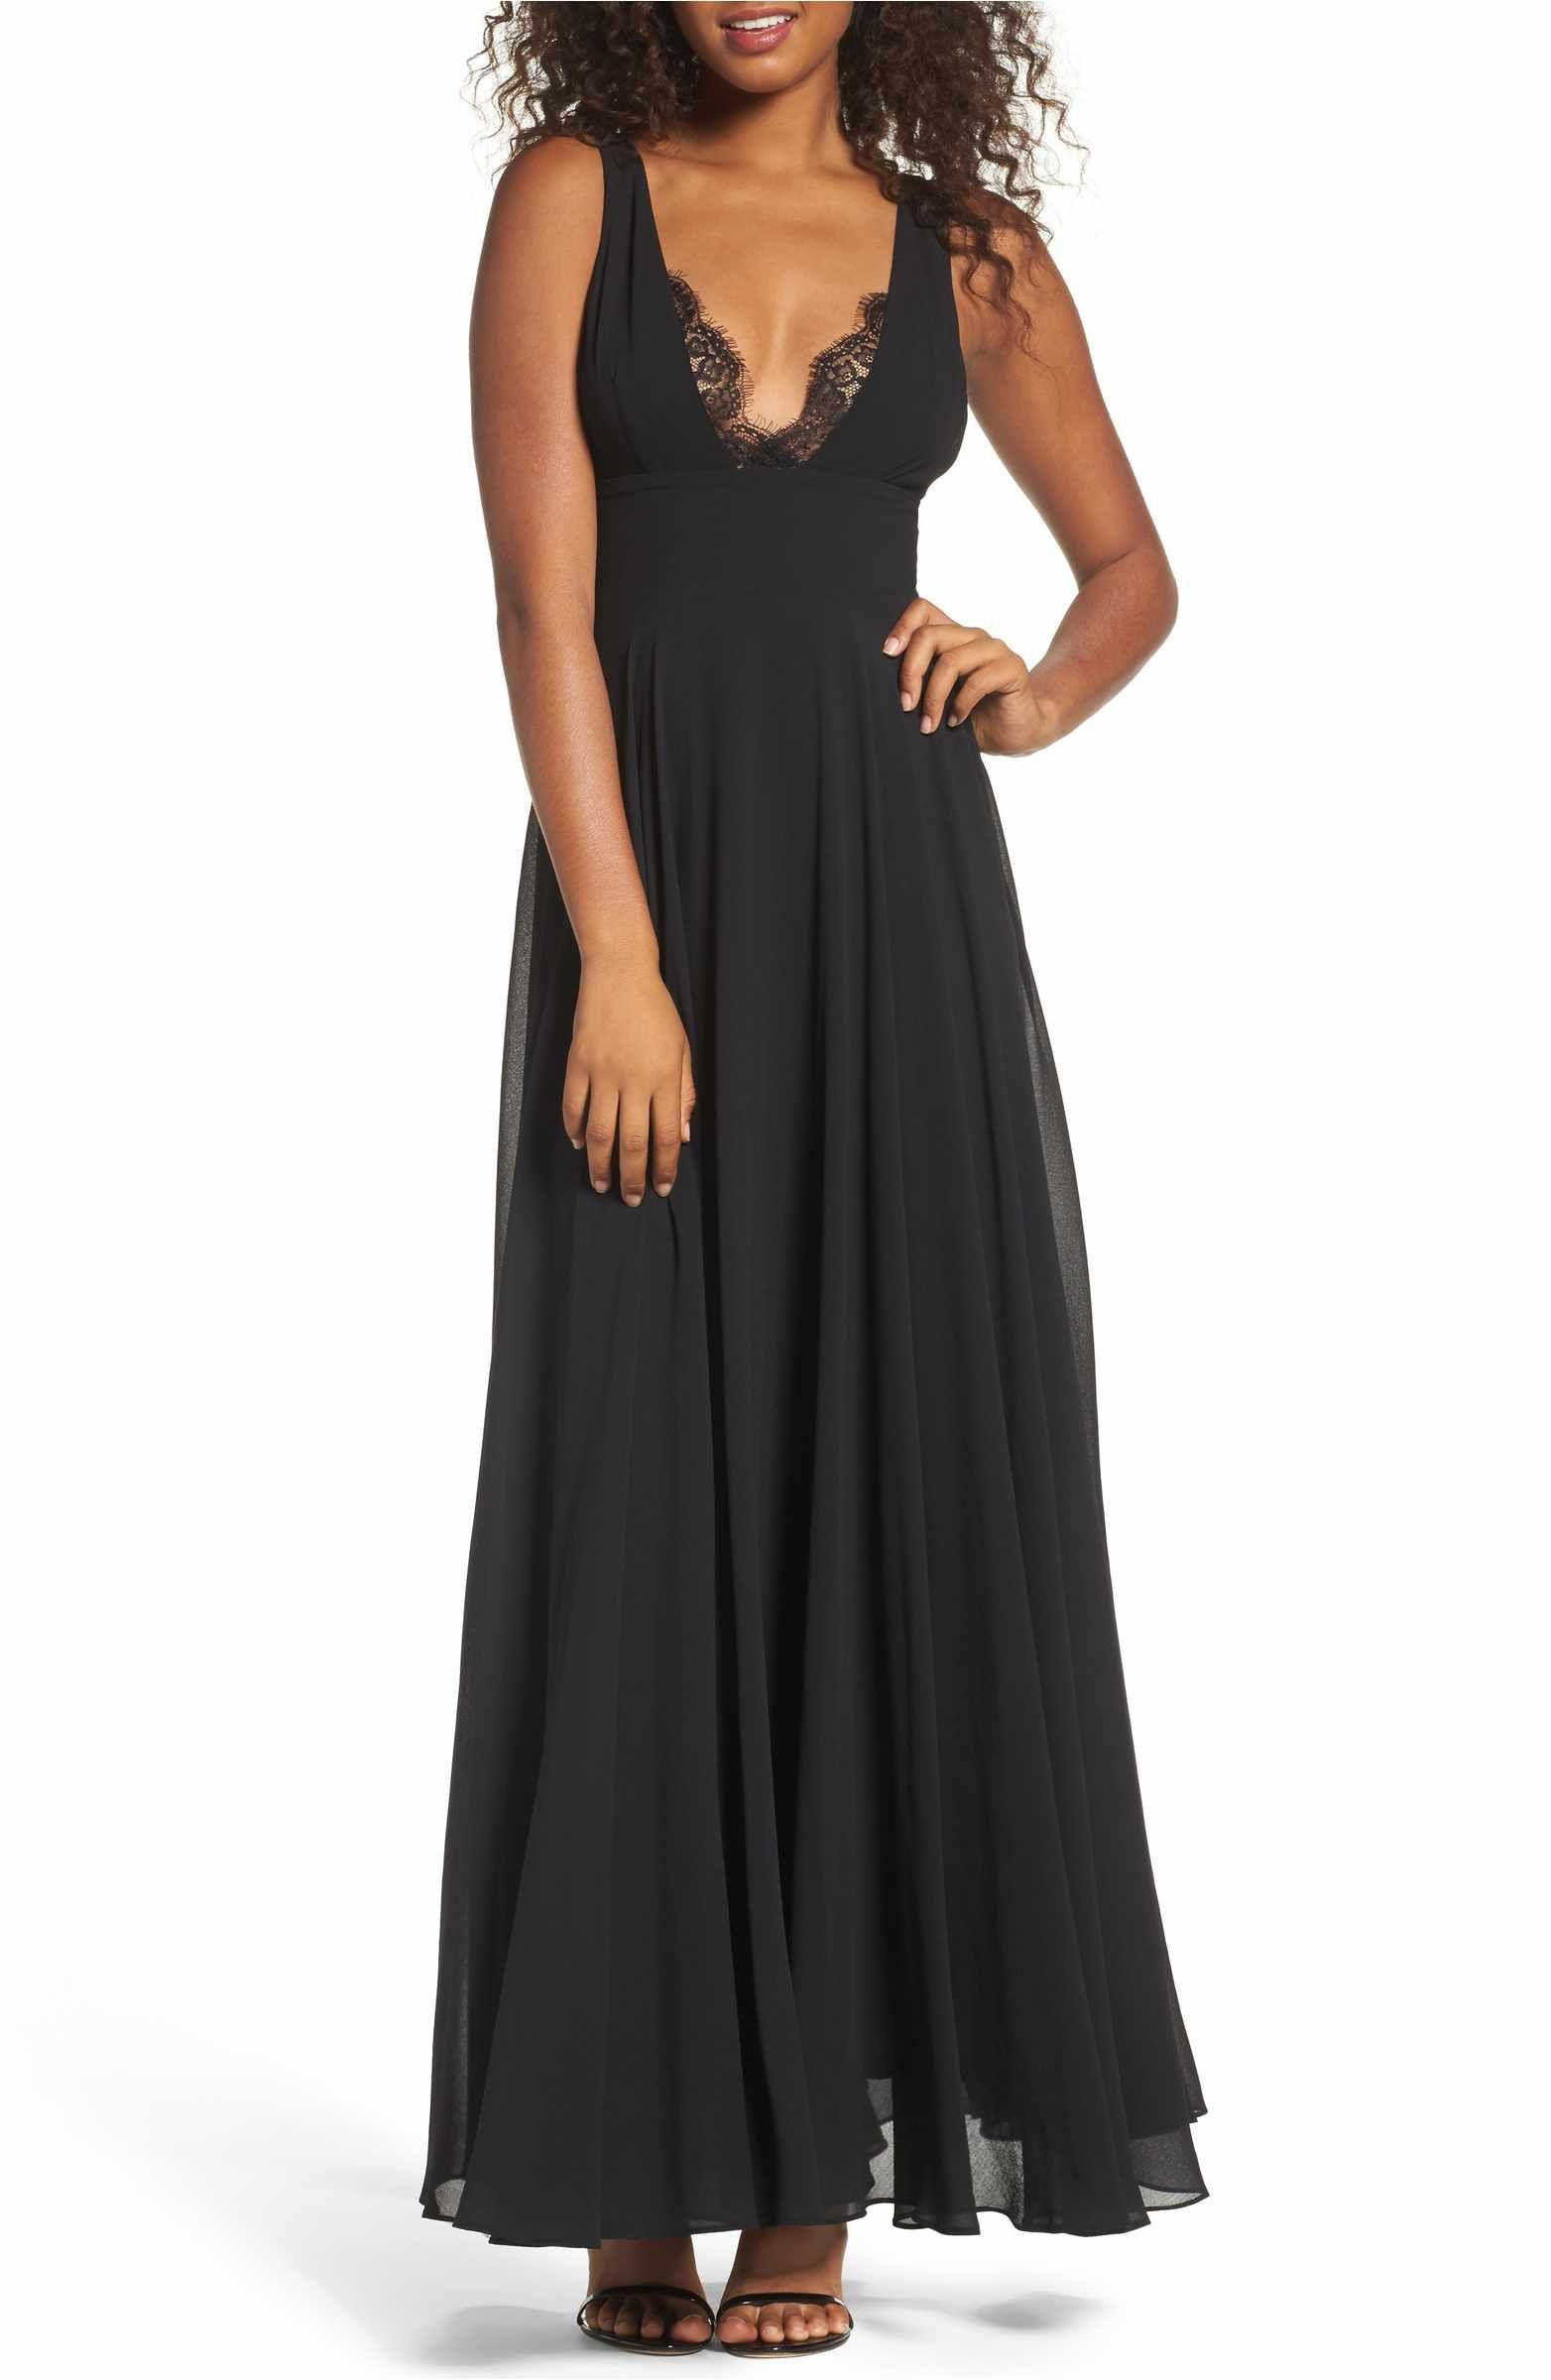 Lulus wedding guest dress  Lace Trim Chiffon Maxi Dress  Chiffon maxi Wedding planning and